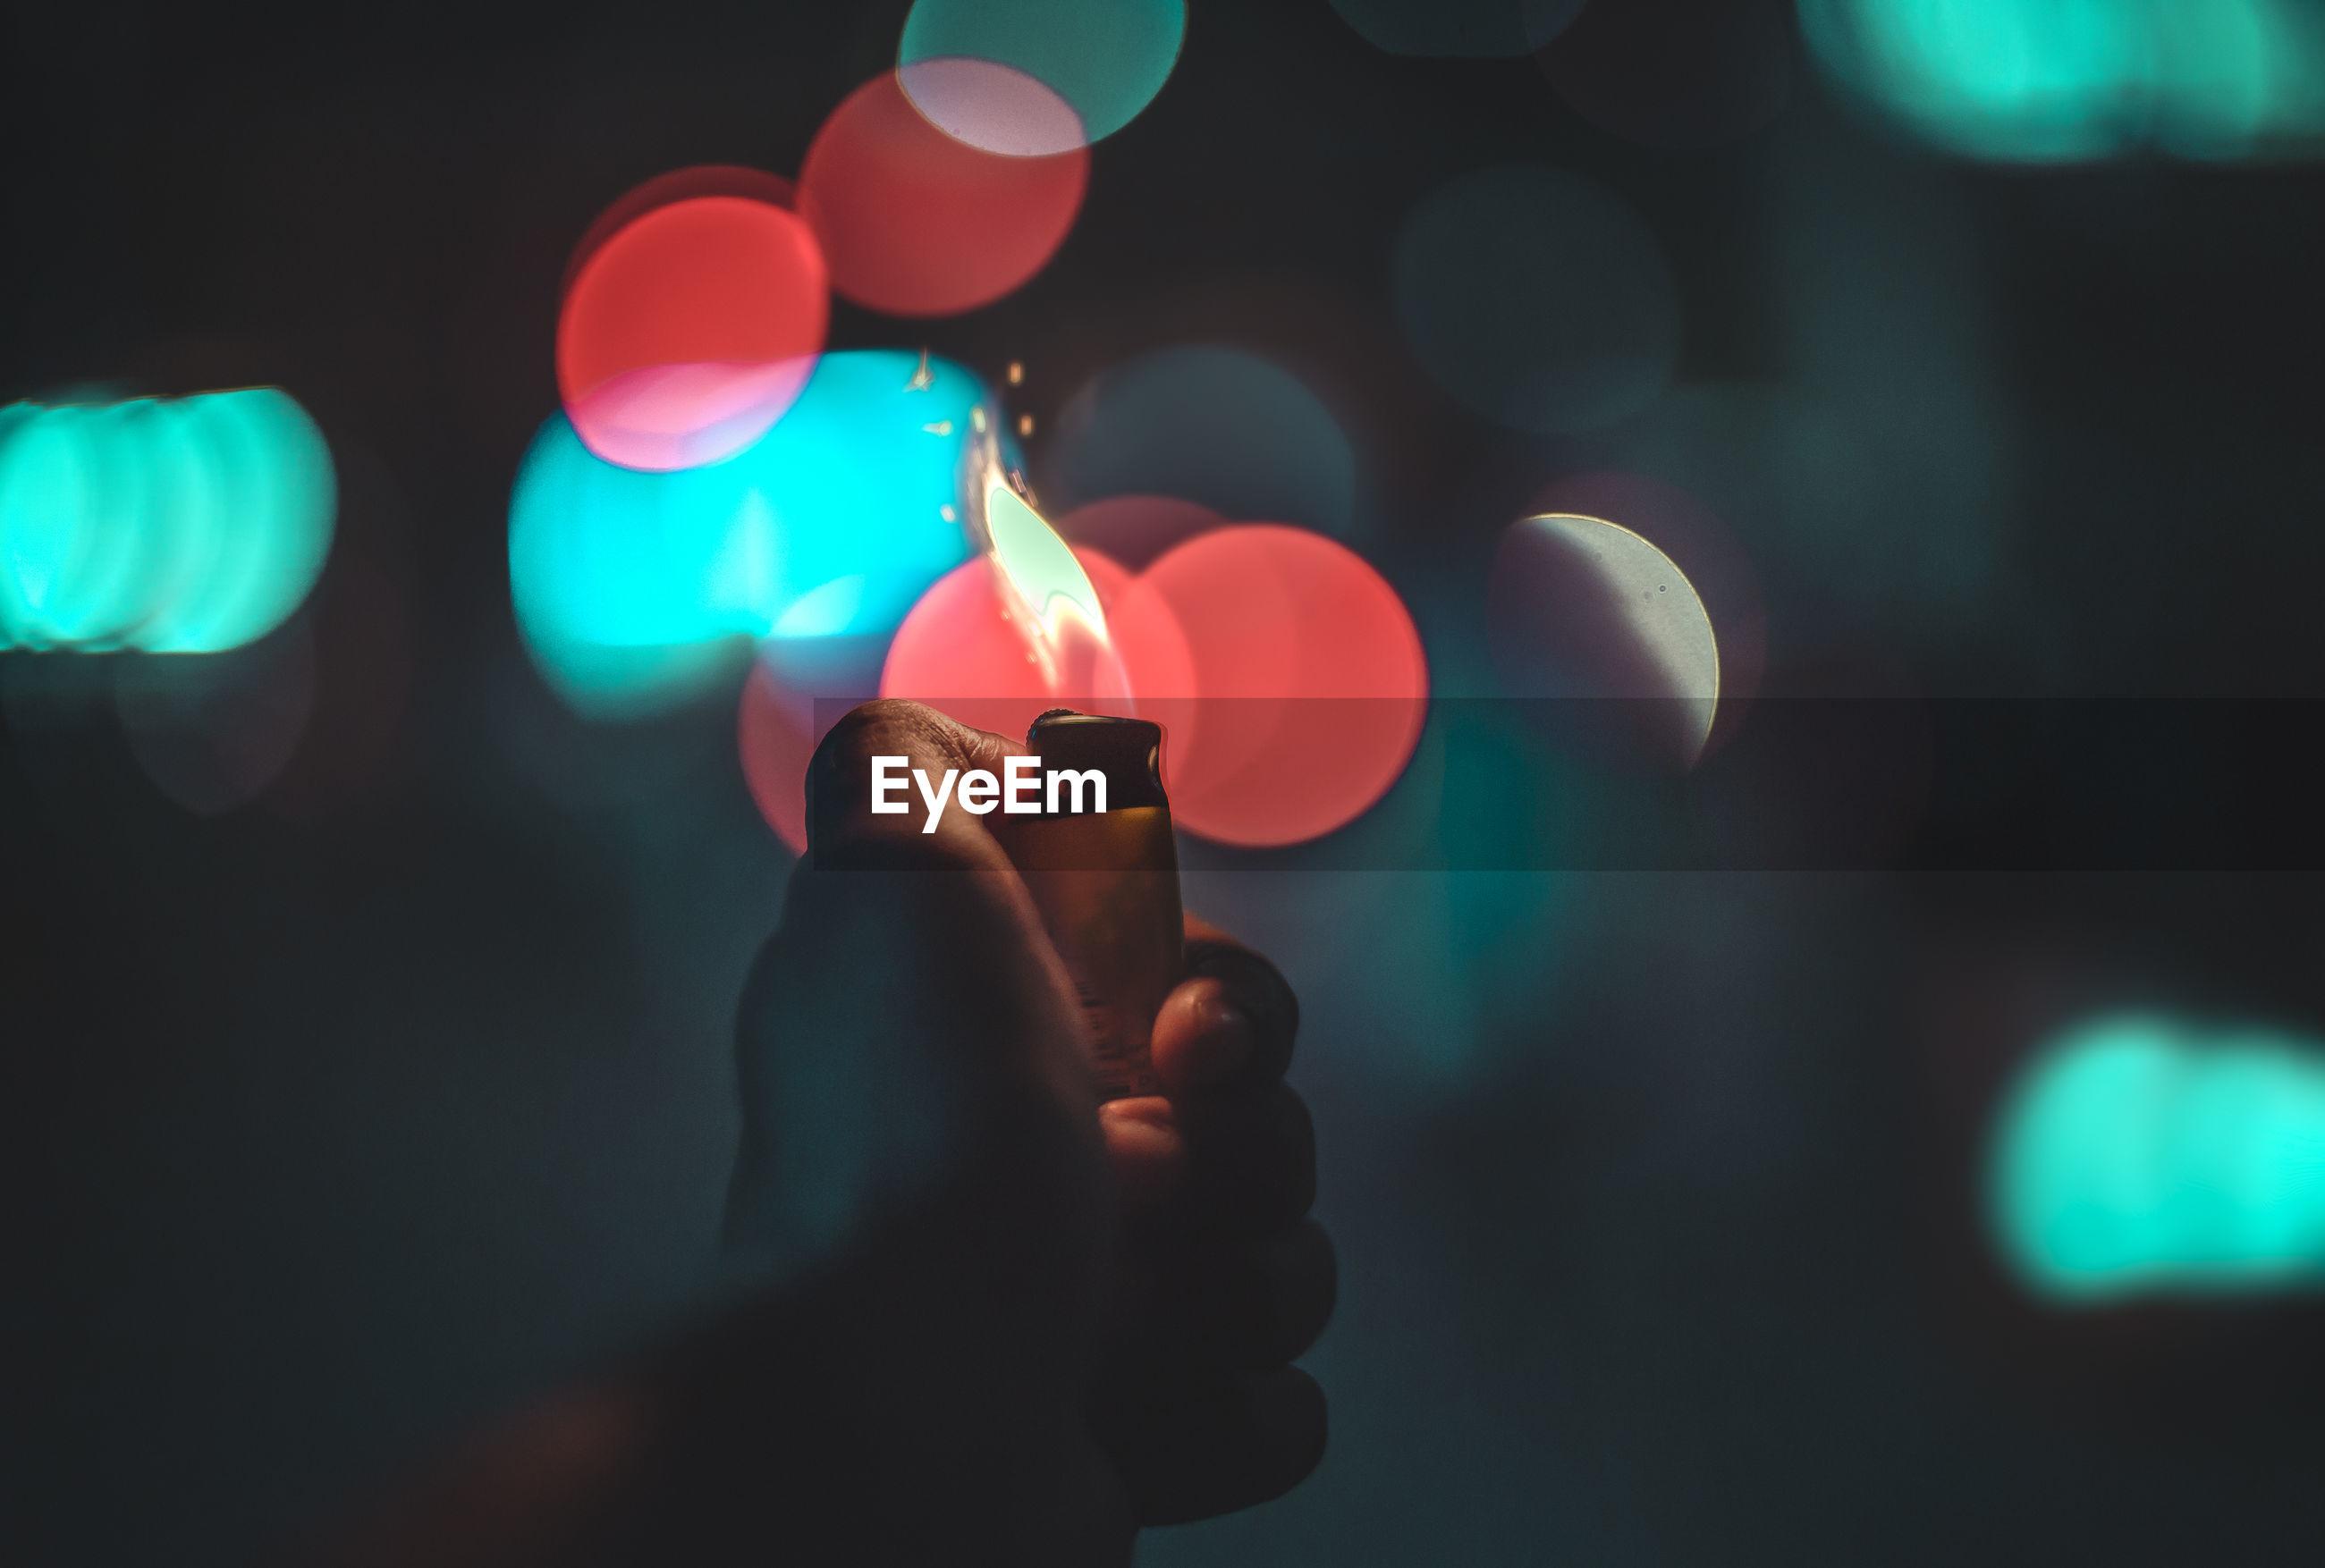 Close-up of human hand holding illuminated cigarette lighter against illuminated lights